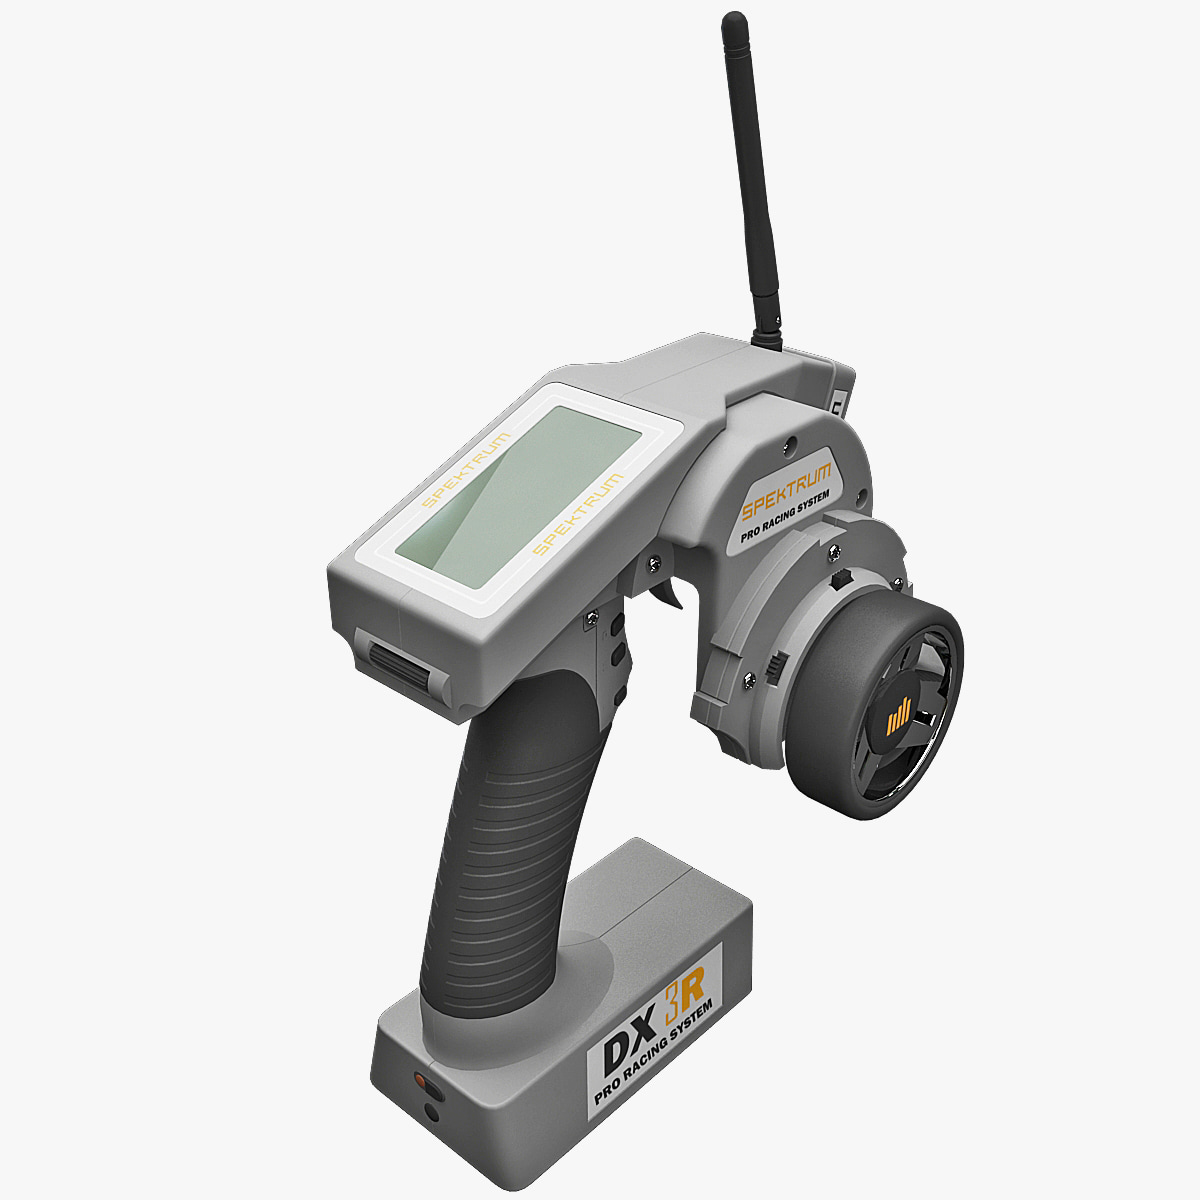 Radio_Control_Transmitter_Spektrum_DX3R_000.jpg